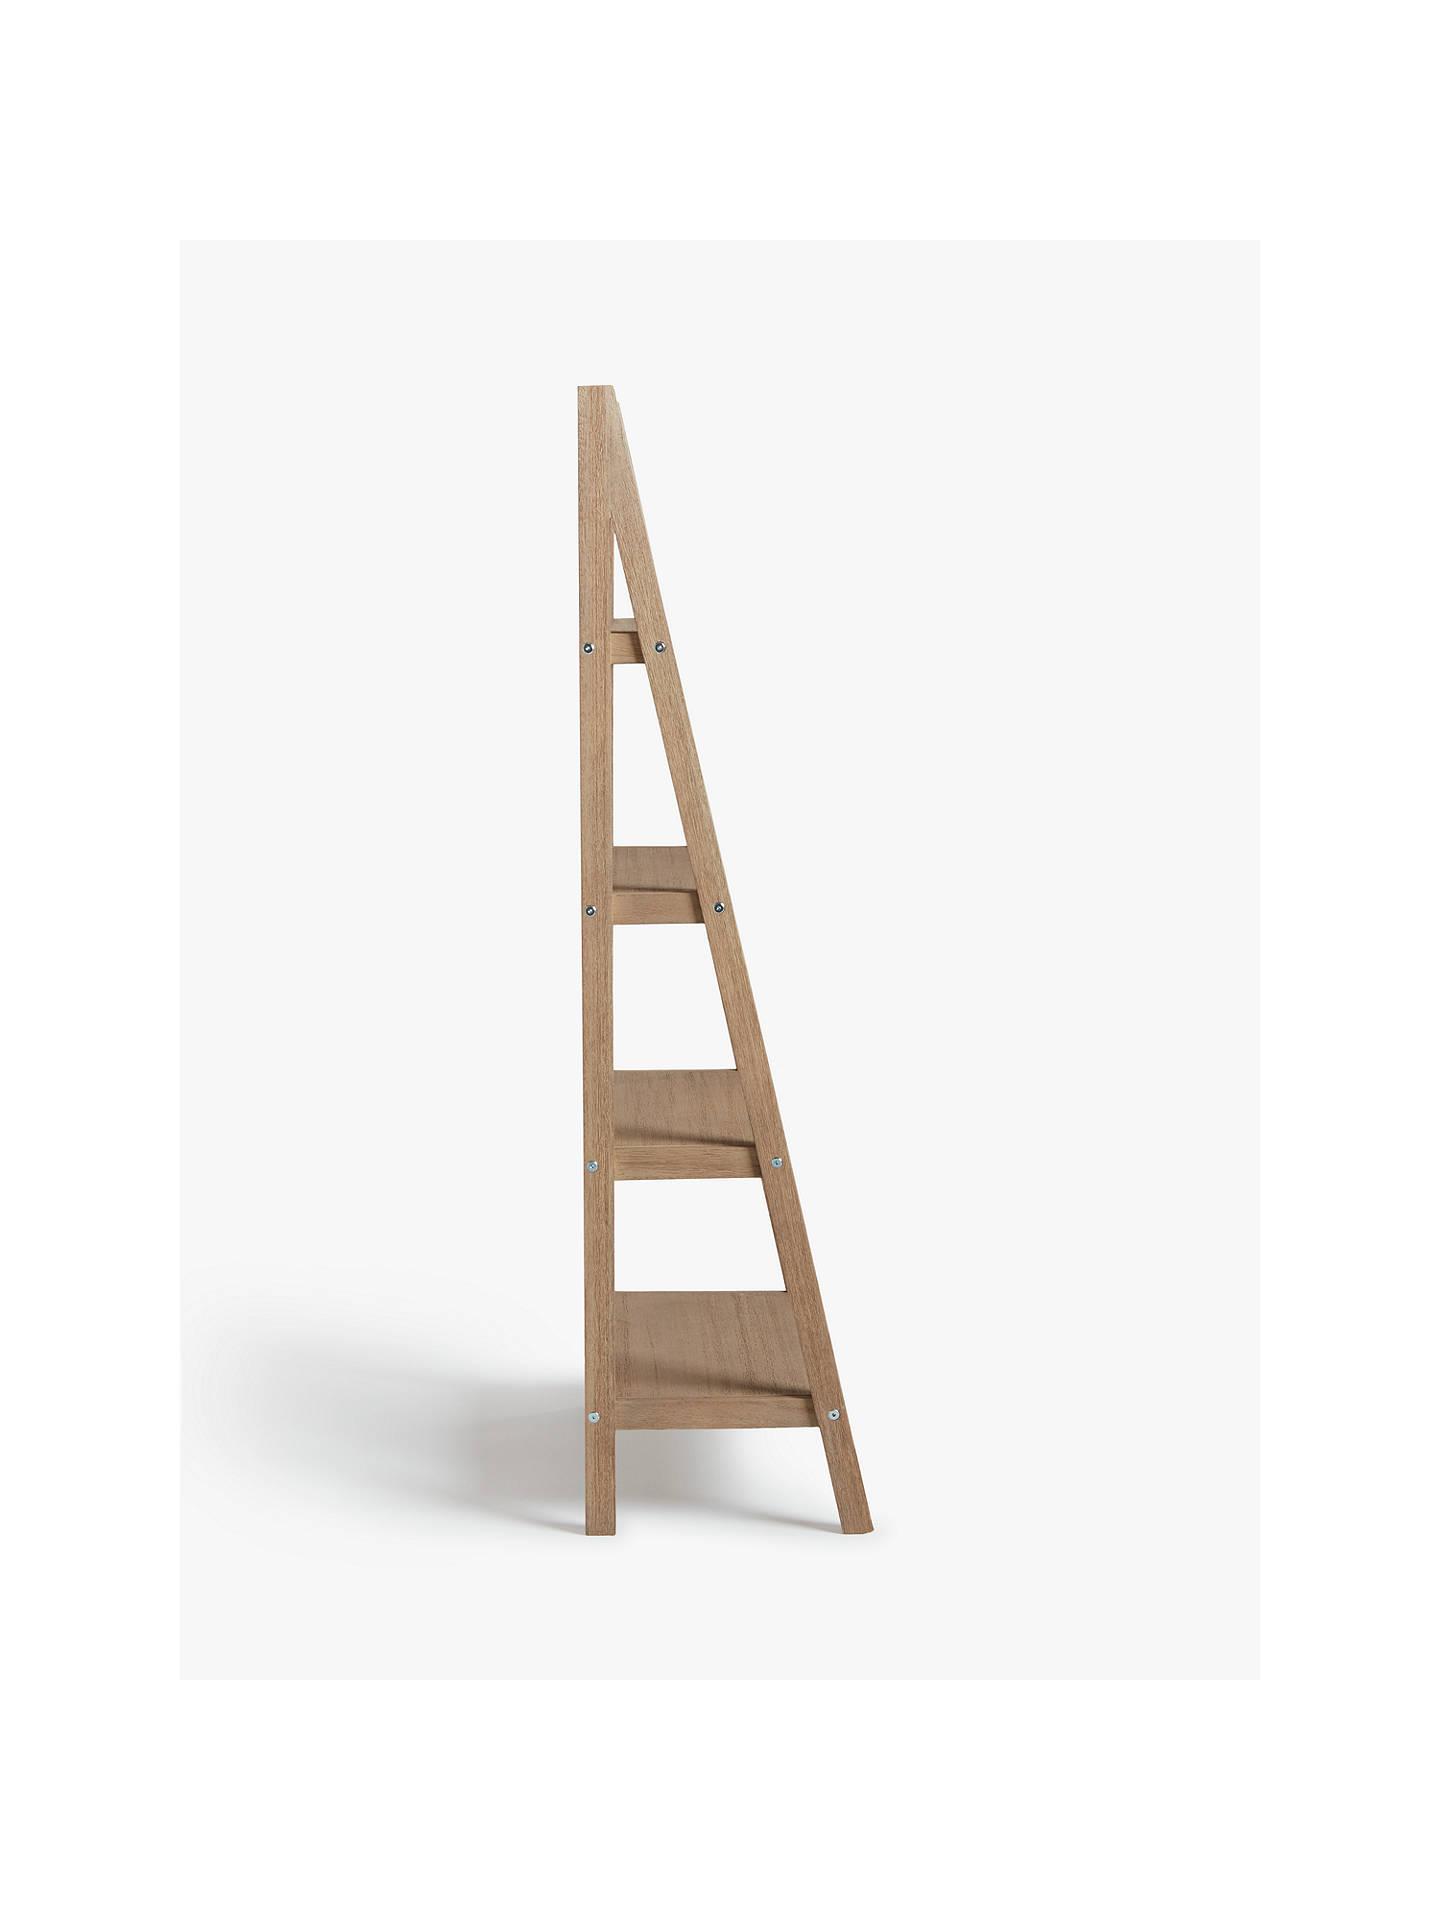 Magnificent Croft Collection Burford Garden Tall Garden Shelf Ladder Fsc Certified Eucalyptus Wood Uwap Interior Chair Design Uwaporg